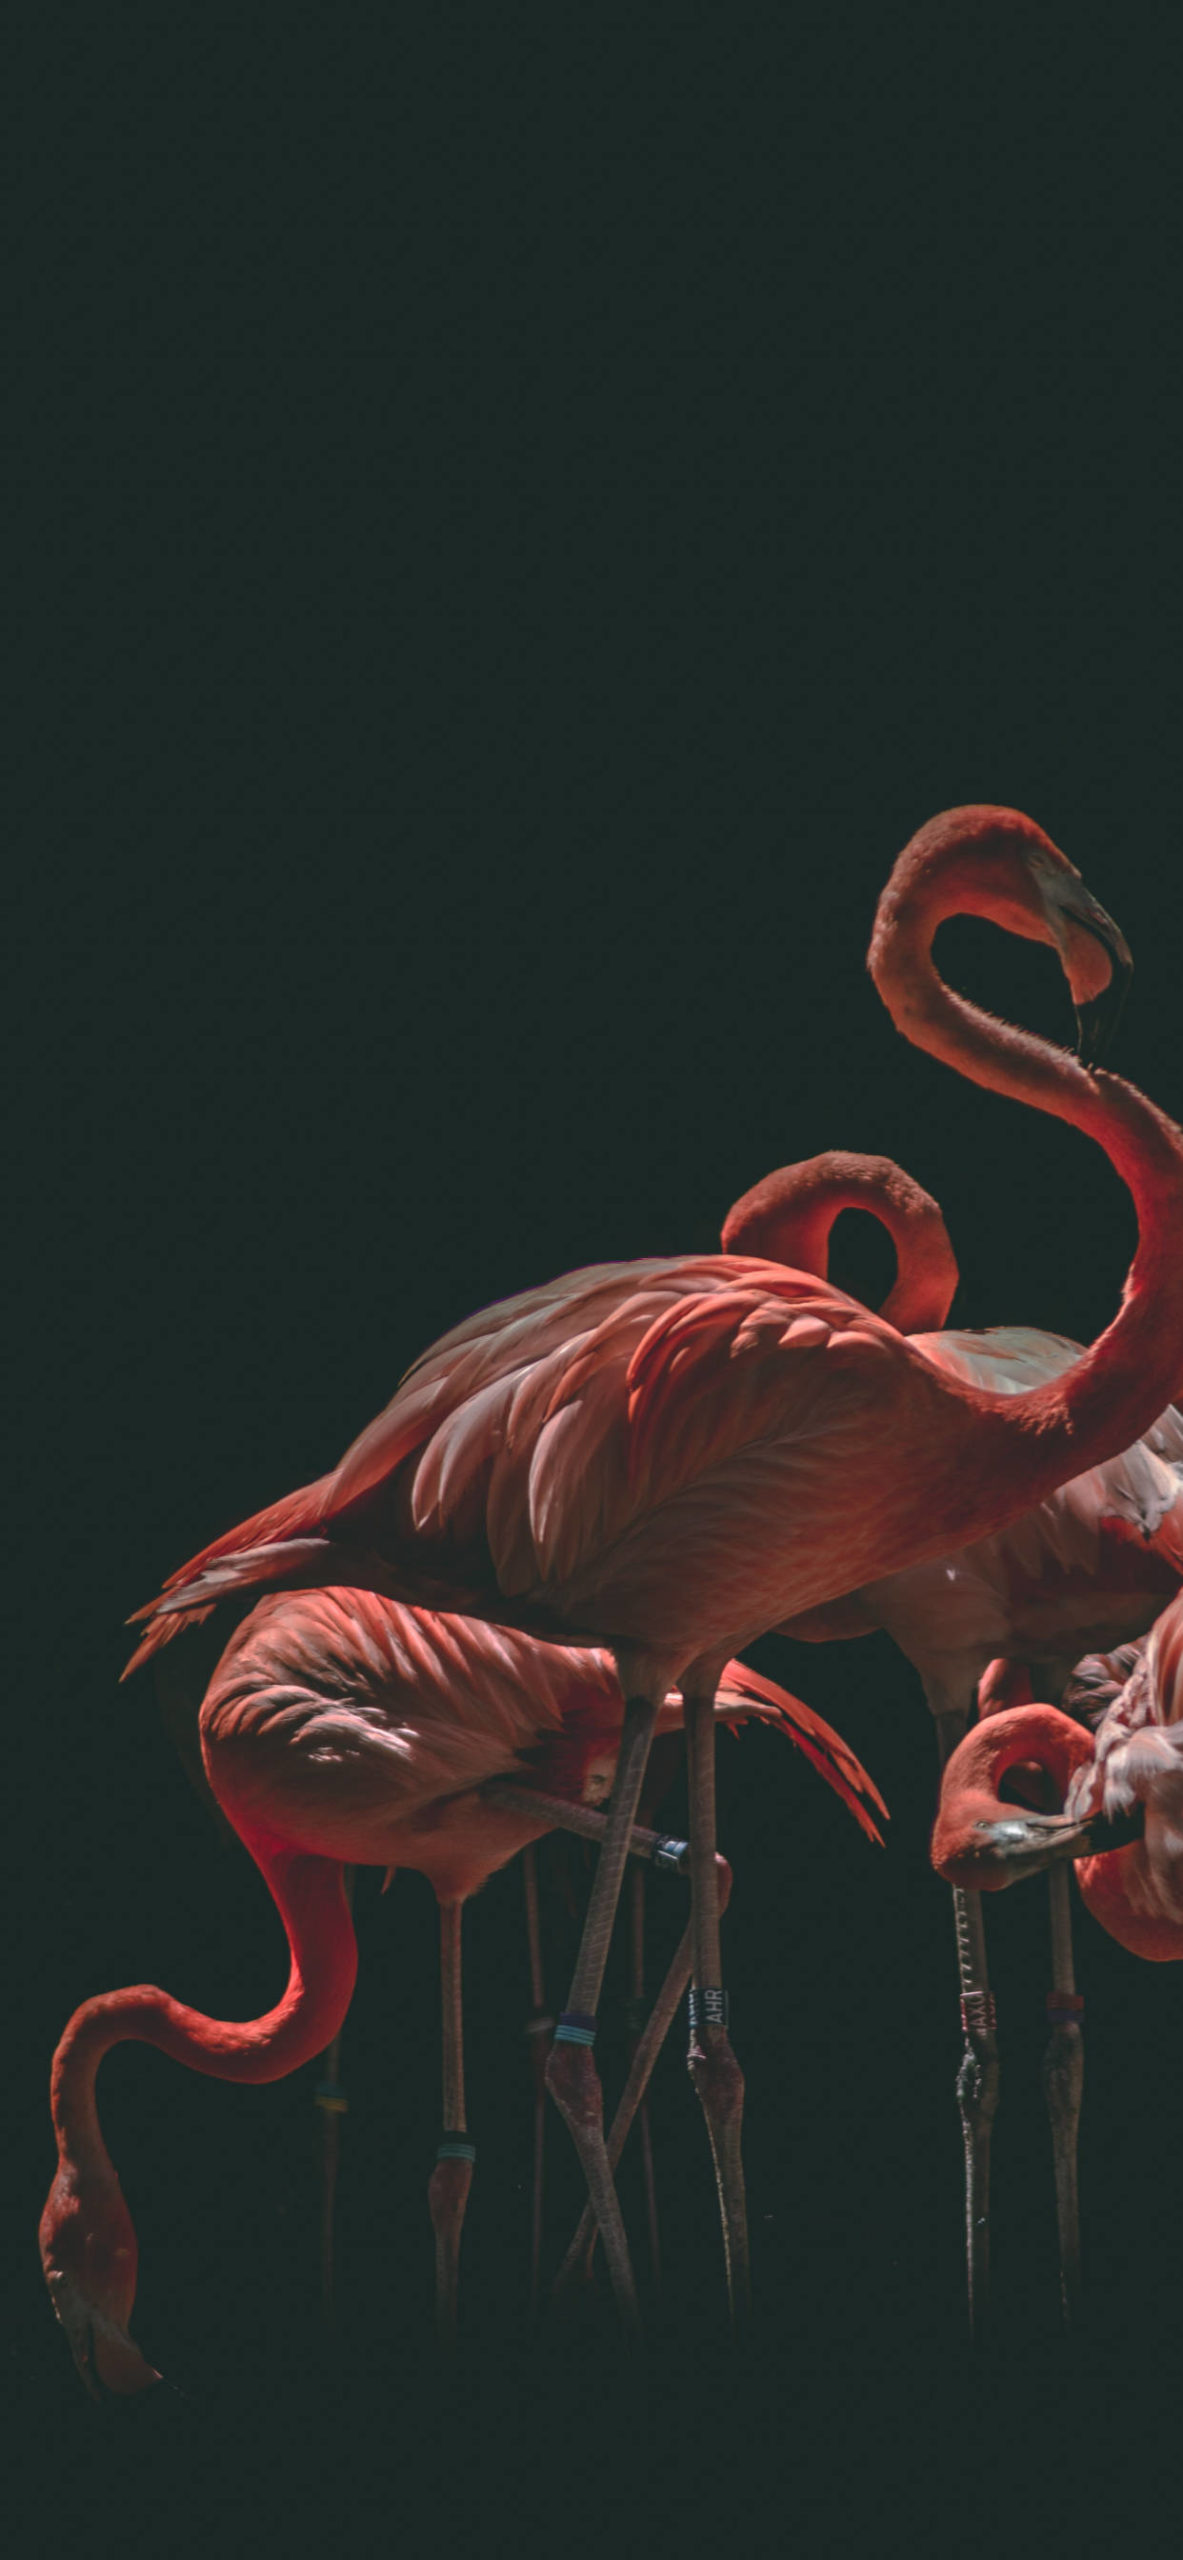 iPhone wallpapers famingo group black scaled Flamingo